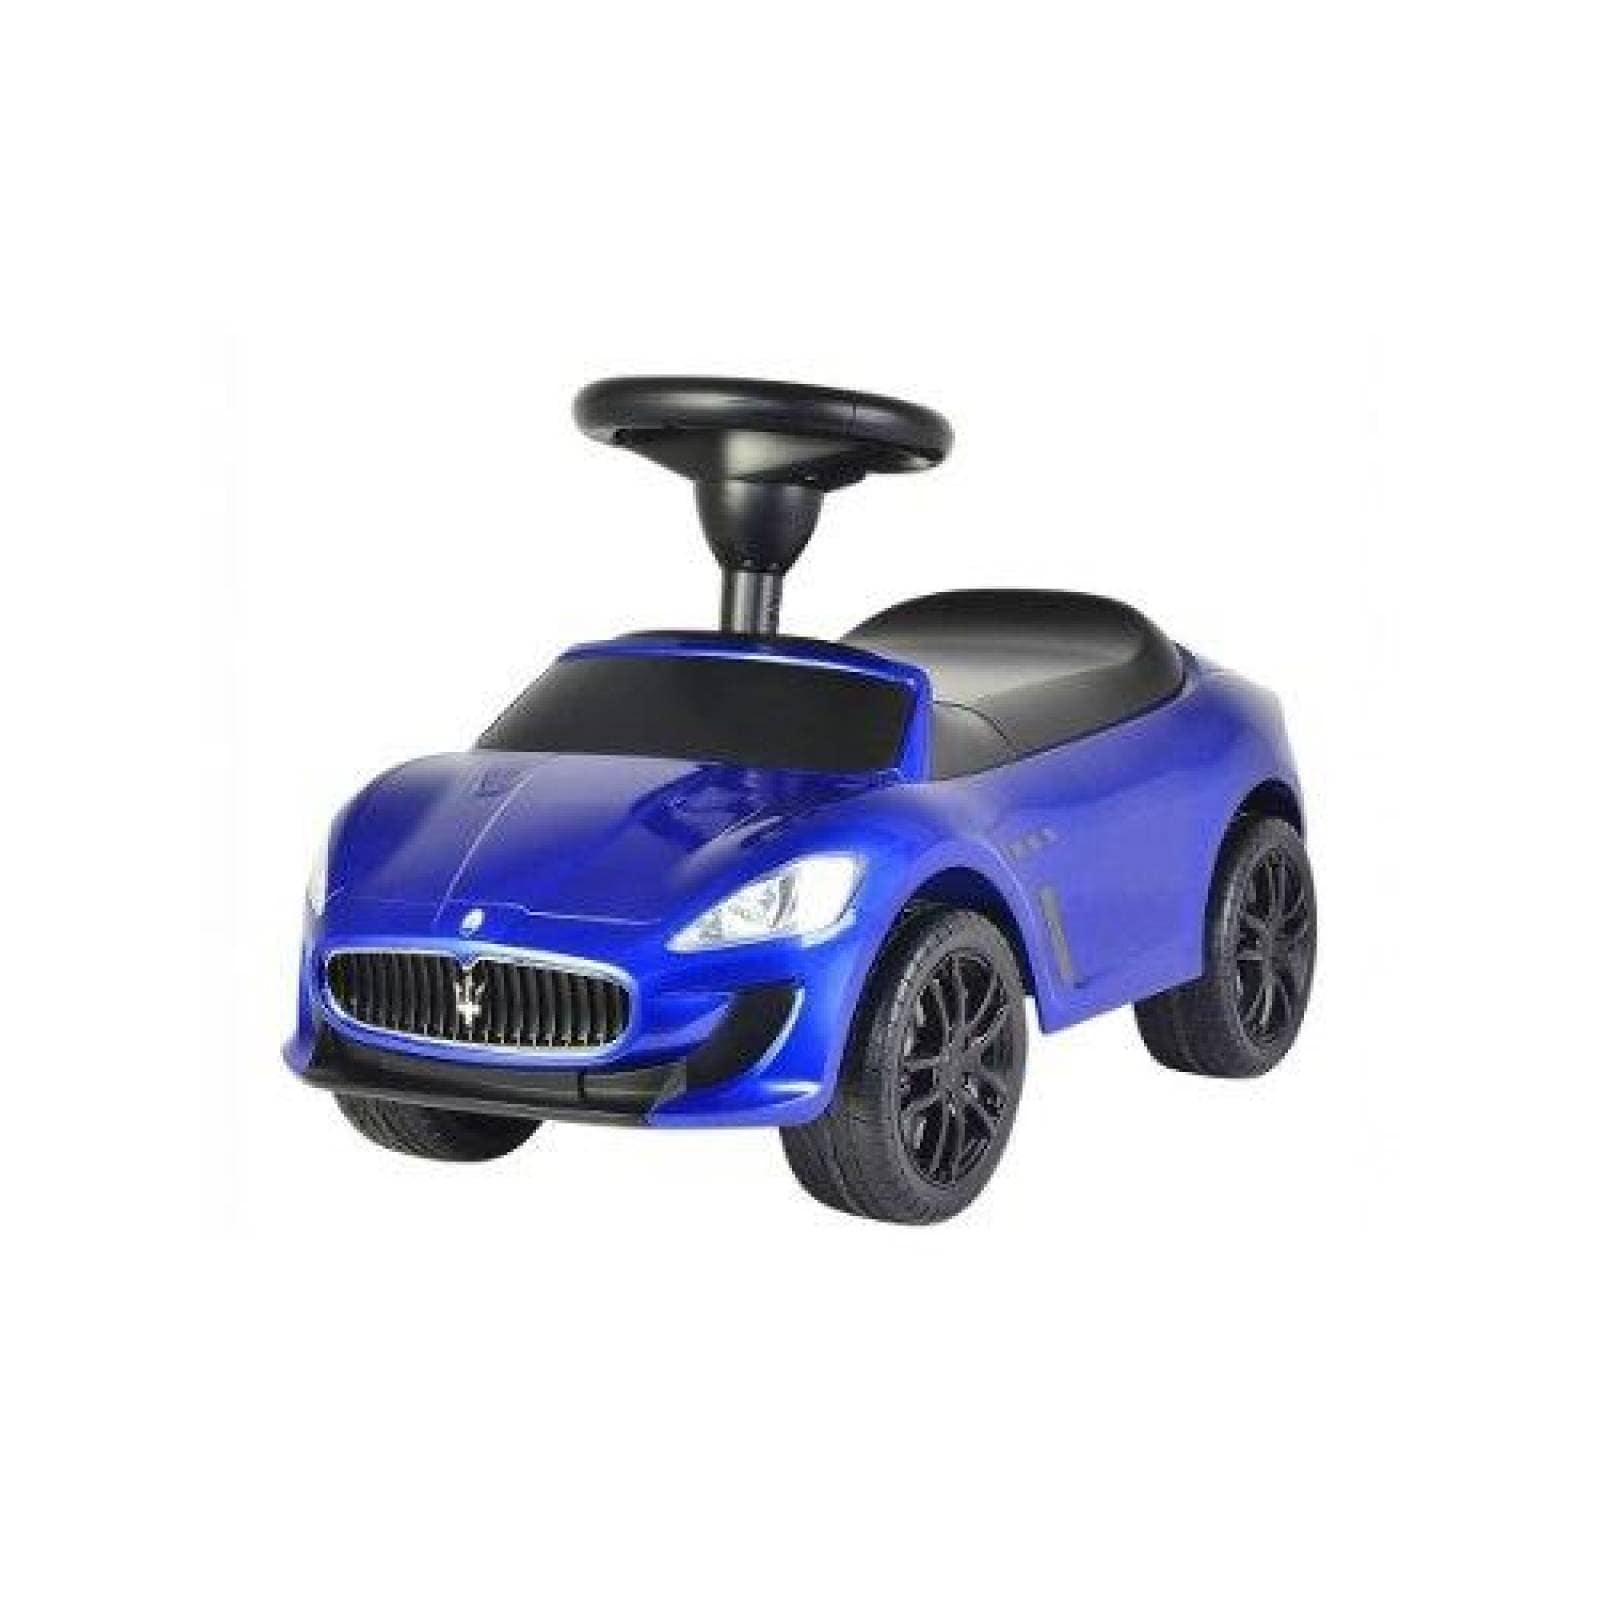 Carro Montable Eléctrico Maserati 4 En 1 Push Car